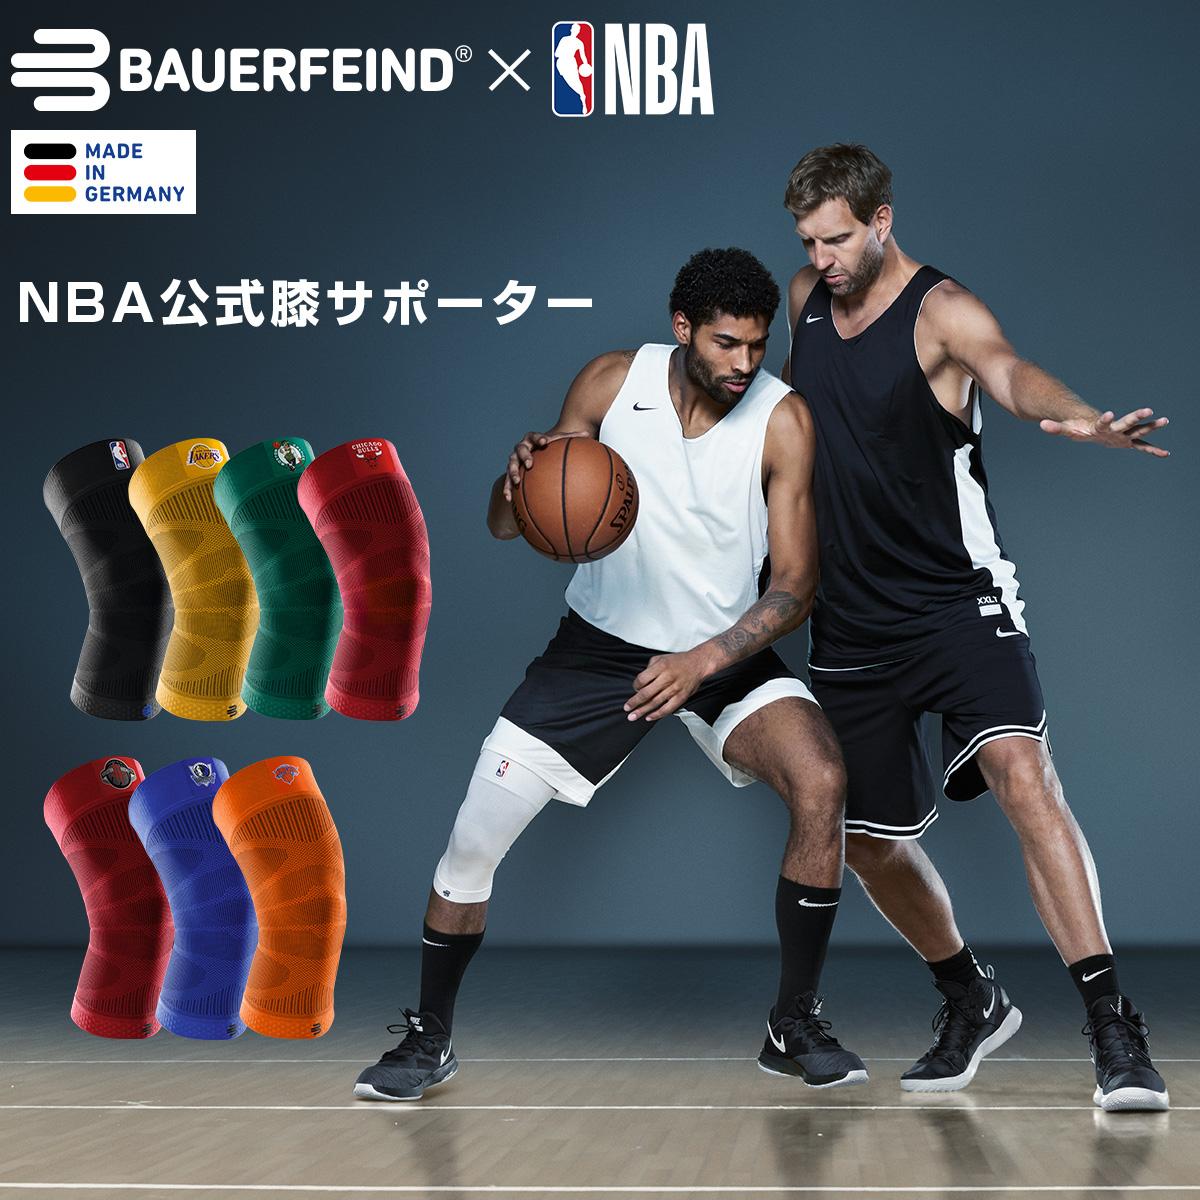 NBA公式膝用サポーター SPORTS COMPRESSION KNEE SUPPORT NBA